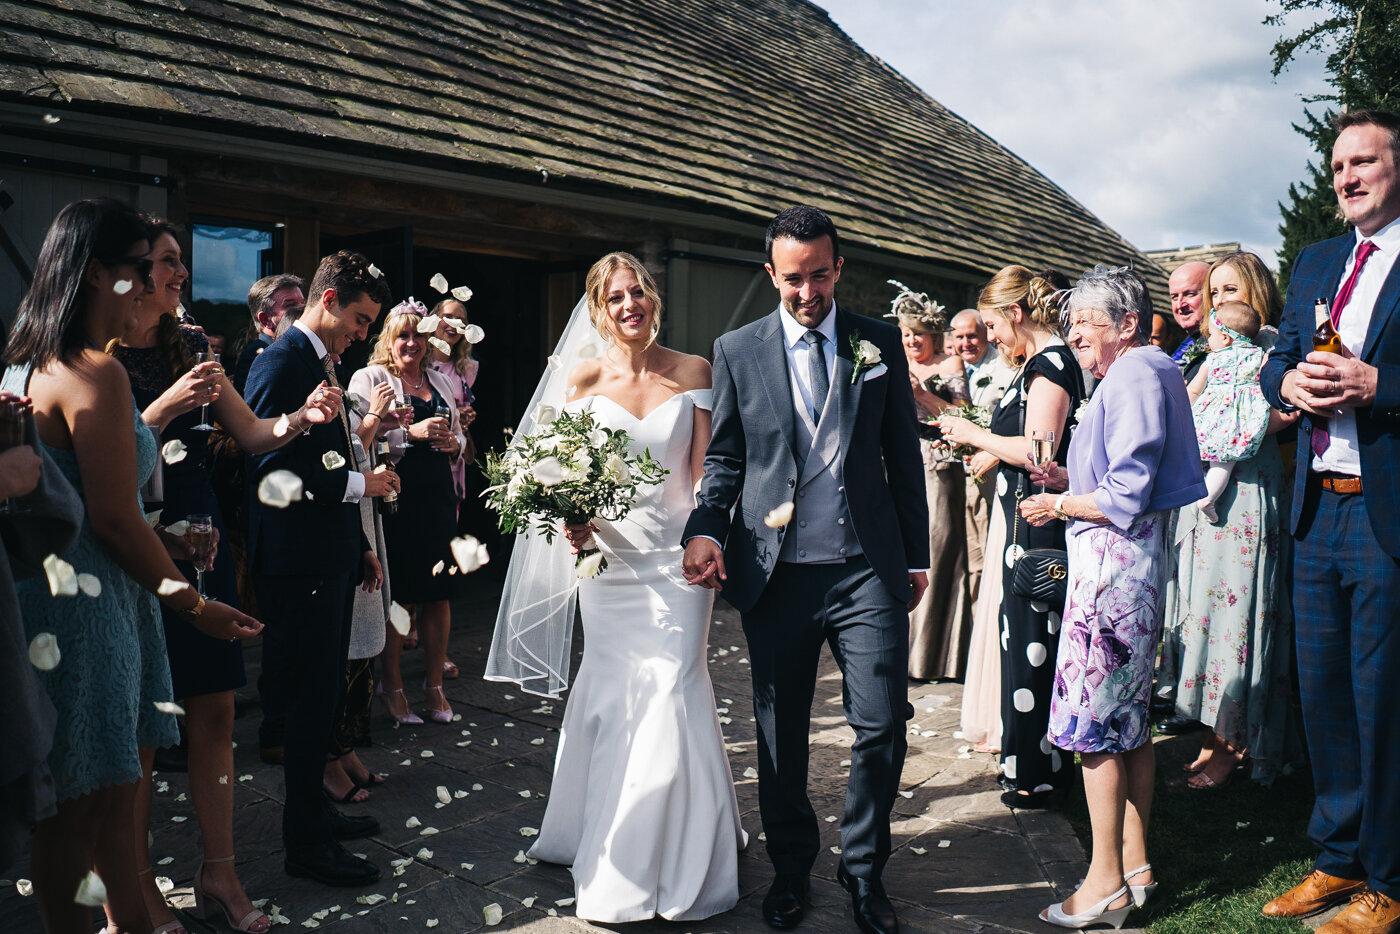 tithe-barn-bolton-abbey-north-yorkshire-cripps-wedding-photographer-creative-0032.jpg